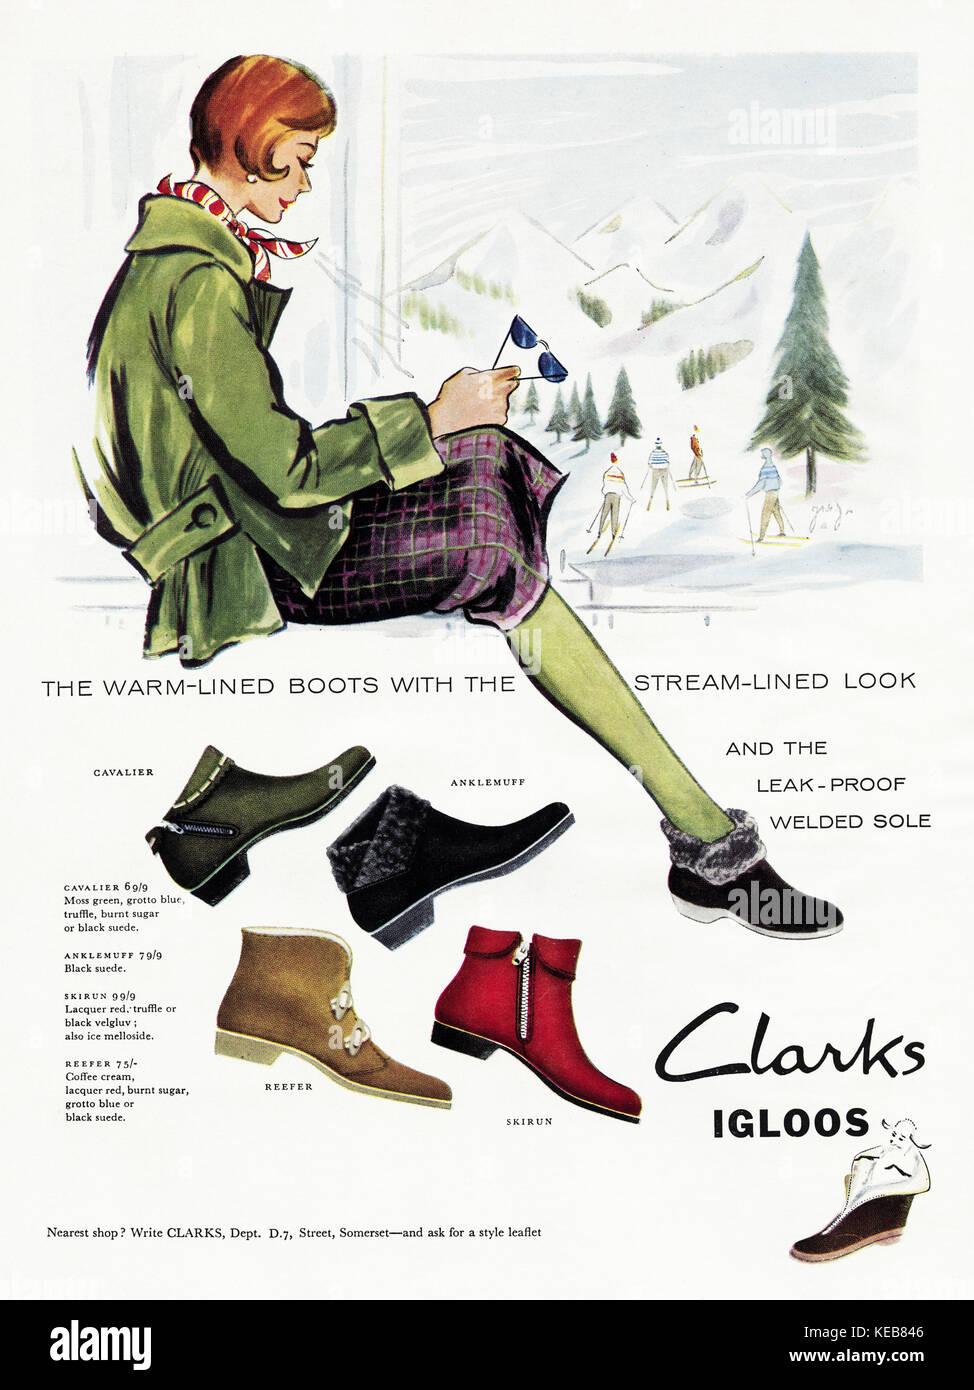 1950s advert old vintage original british magazine advertisement advertising Clarks Igloo boots dated 1958 - Stock Image